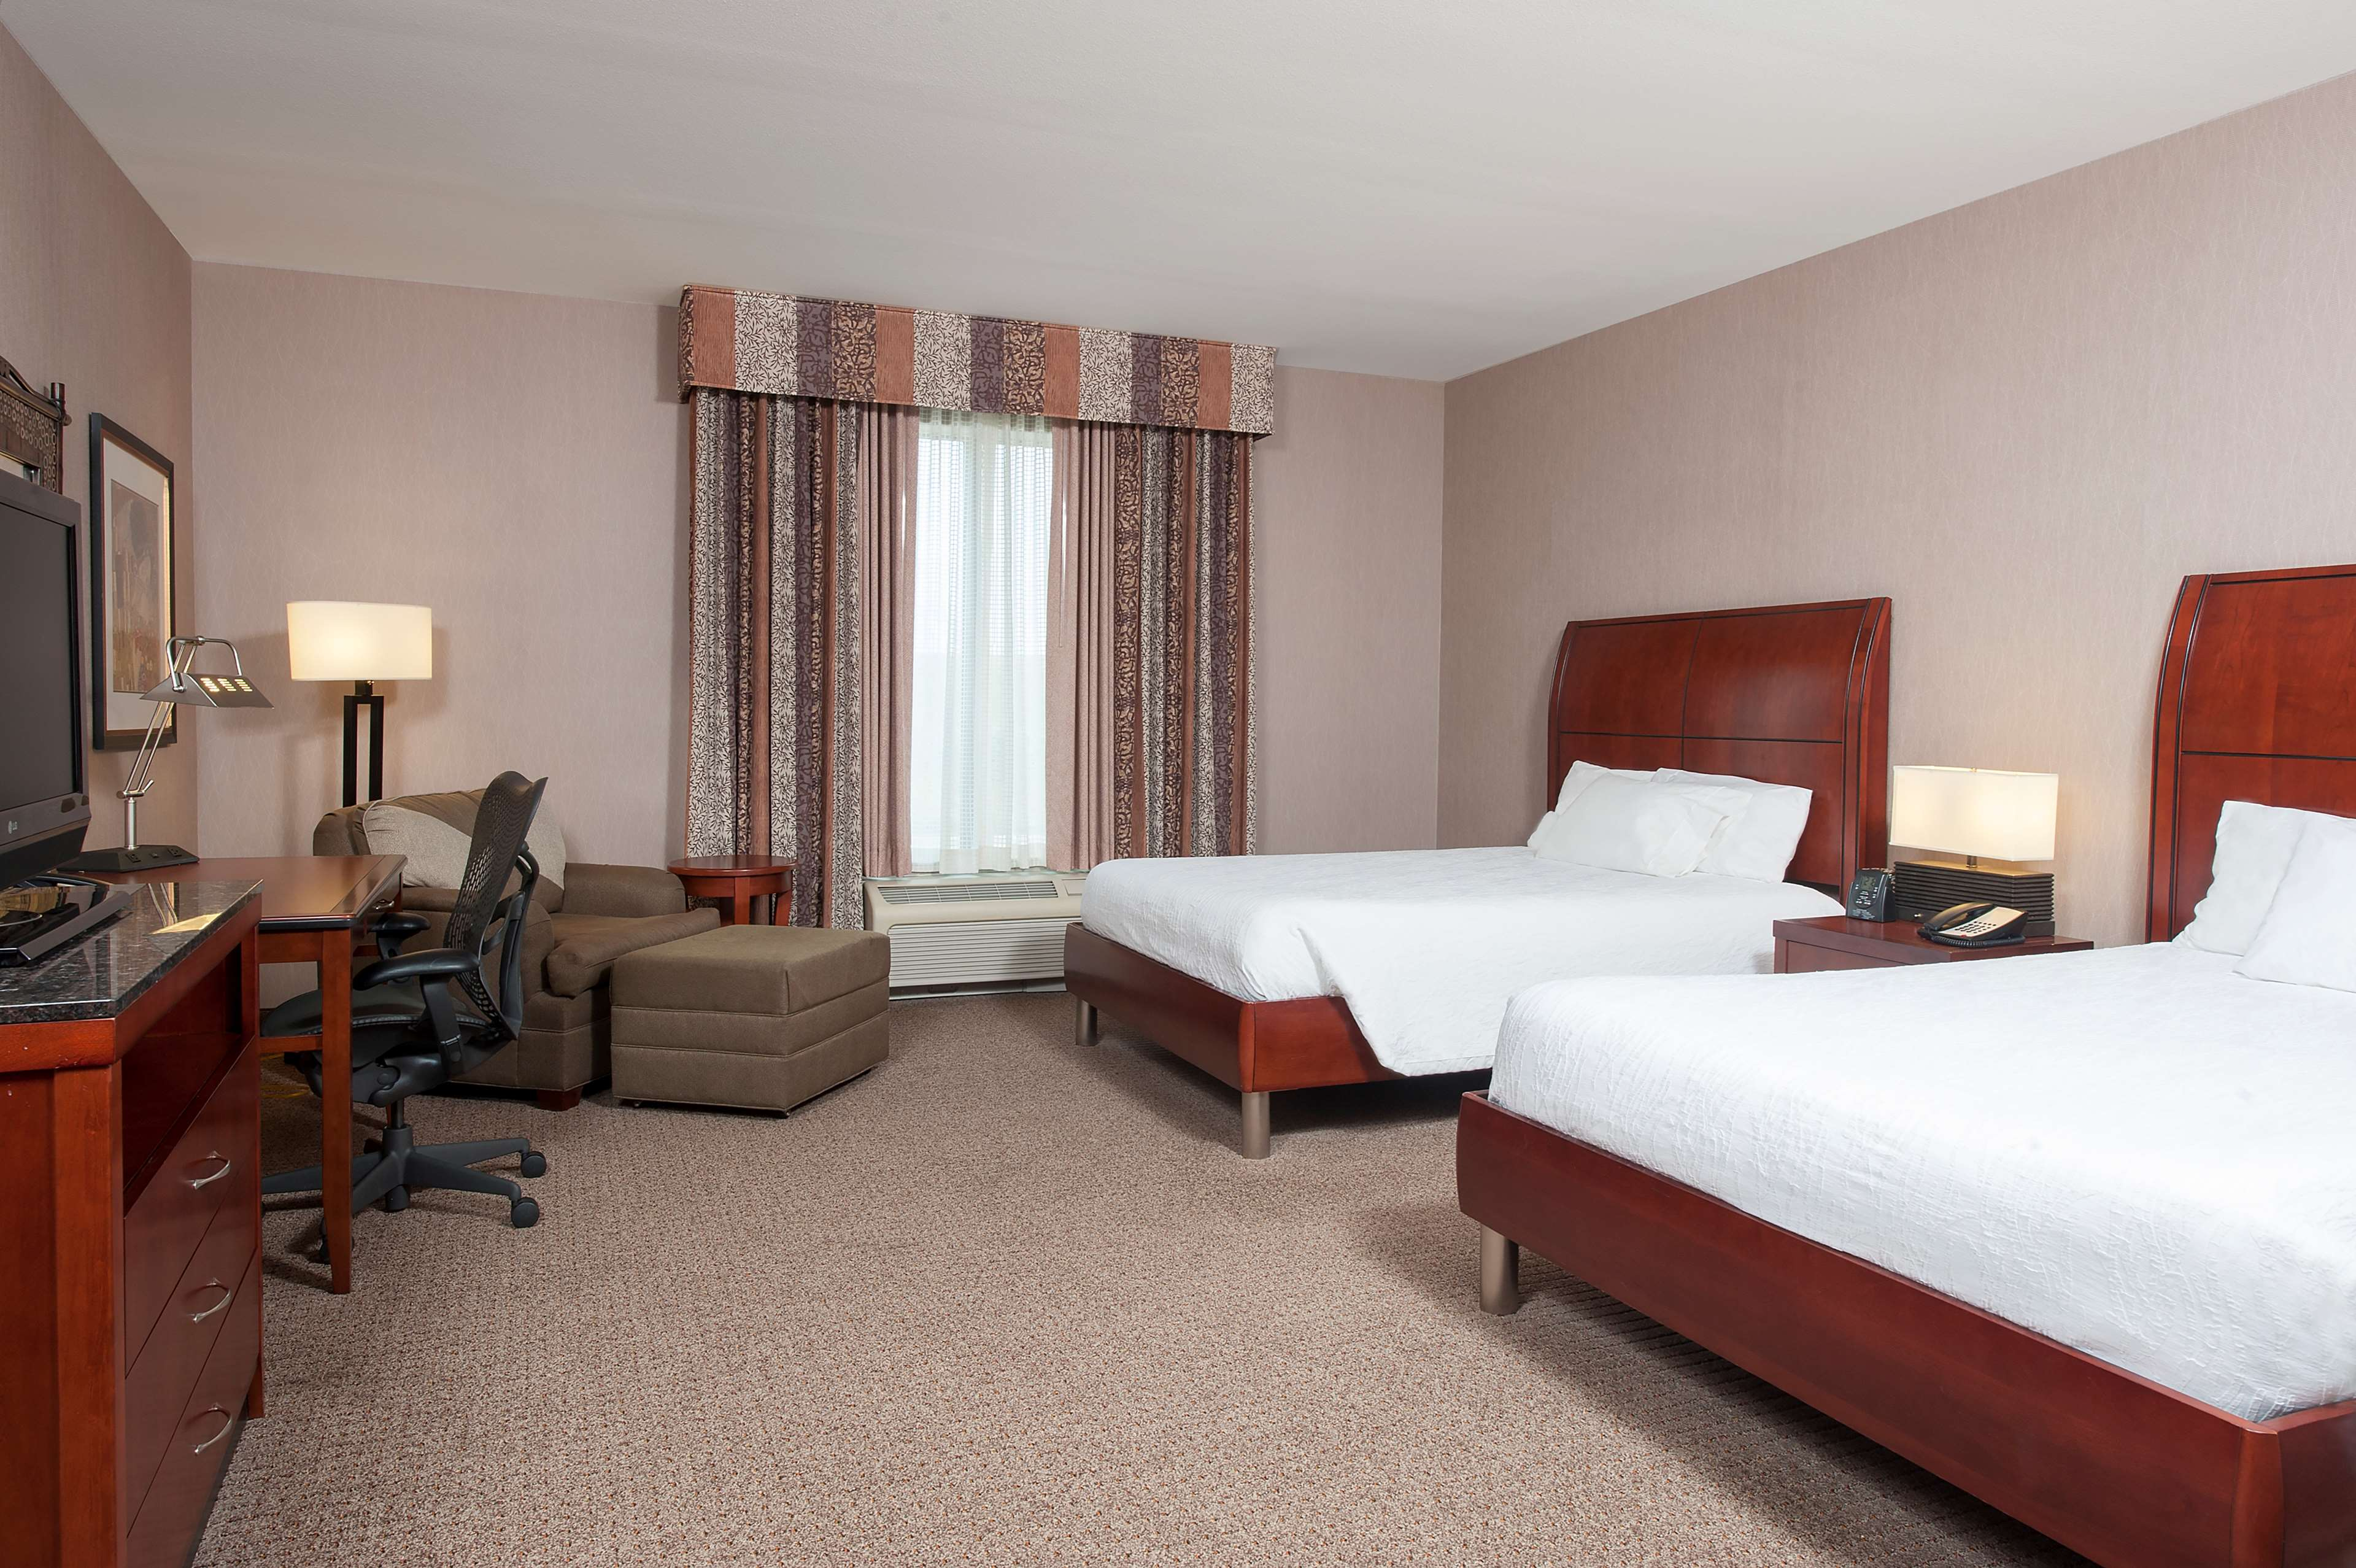 Hilton Garden Inn Indianapolis South/Greenwood image 17